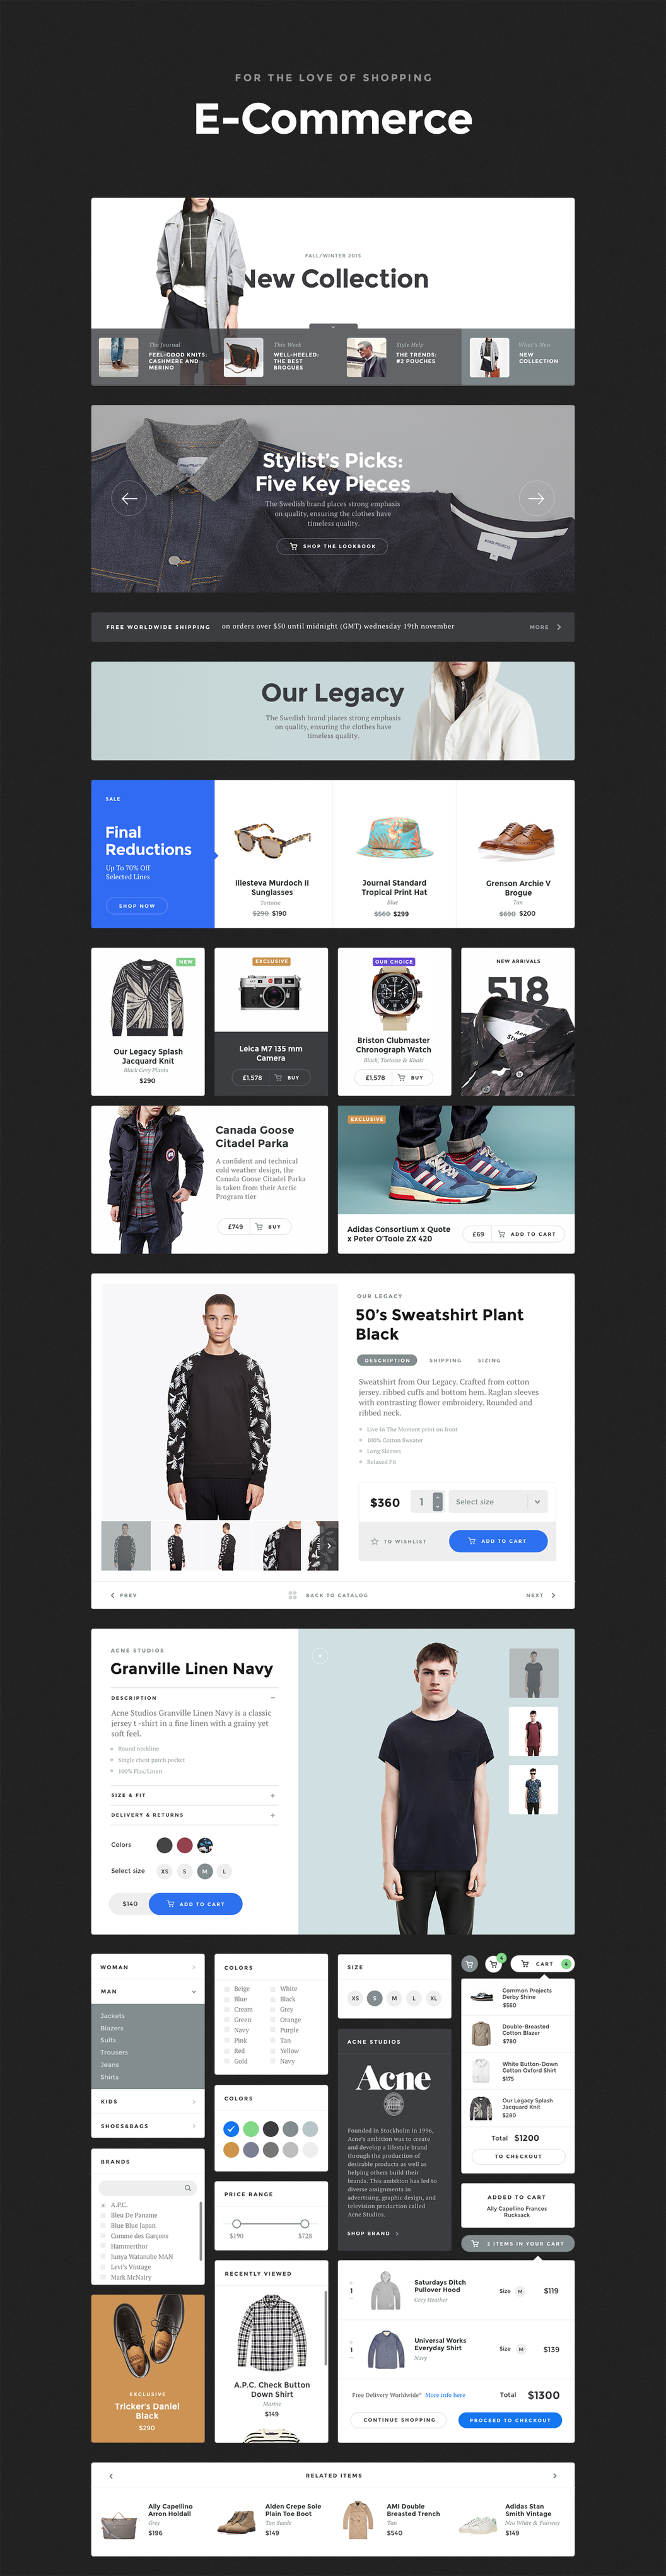 web ui design tools - full_Ecommerce_1421784203494